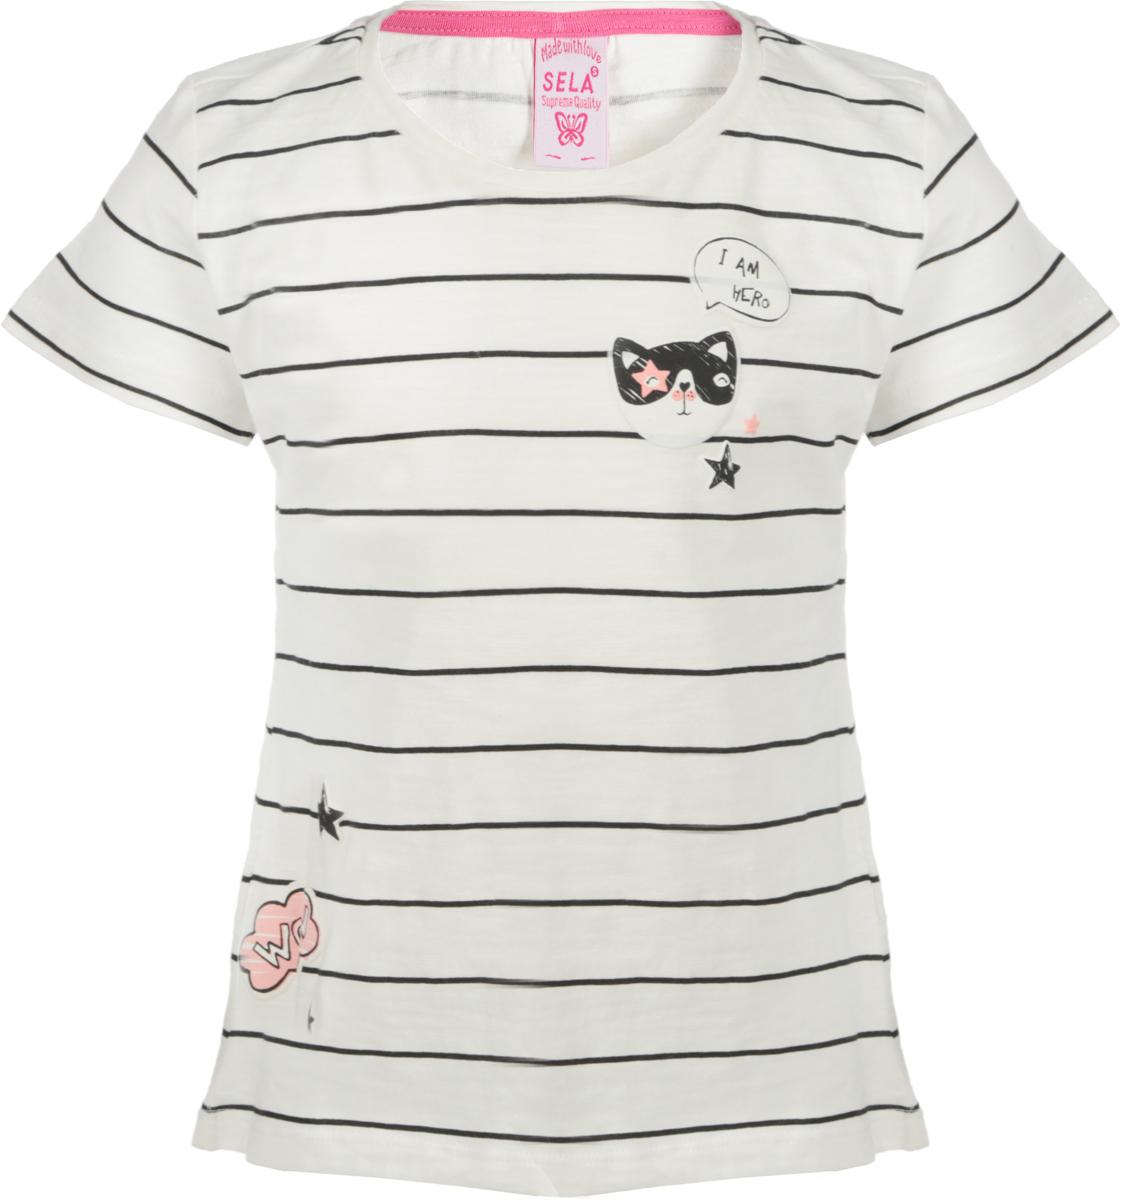 Футболка для девочки Sela, цвет: белый. Ts-511/468-8121. Размер 116 футболка для девочки sela цвет молочный белый ts 511 476 8122 размер 116 6 лет